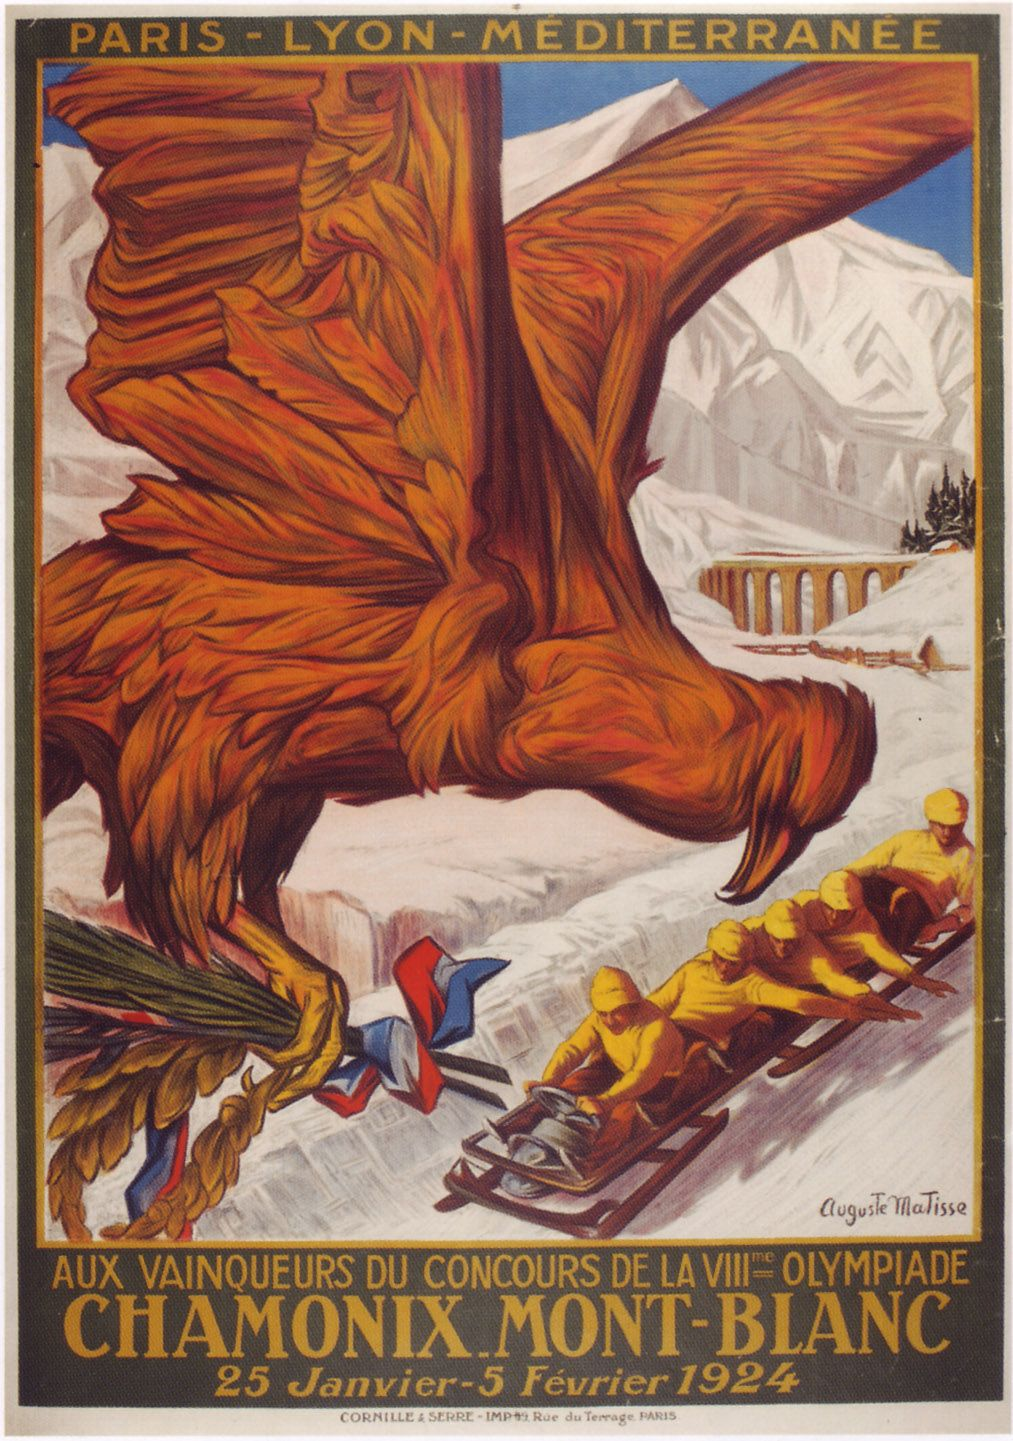 CHAMONIX 1924 Vintage French Ice Skating Poster Giclee Canvas Print 20x28